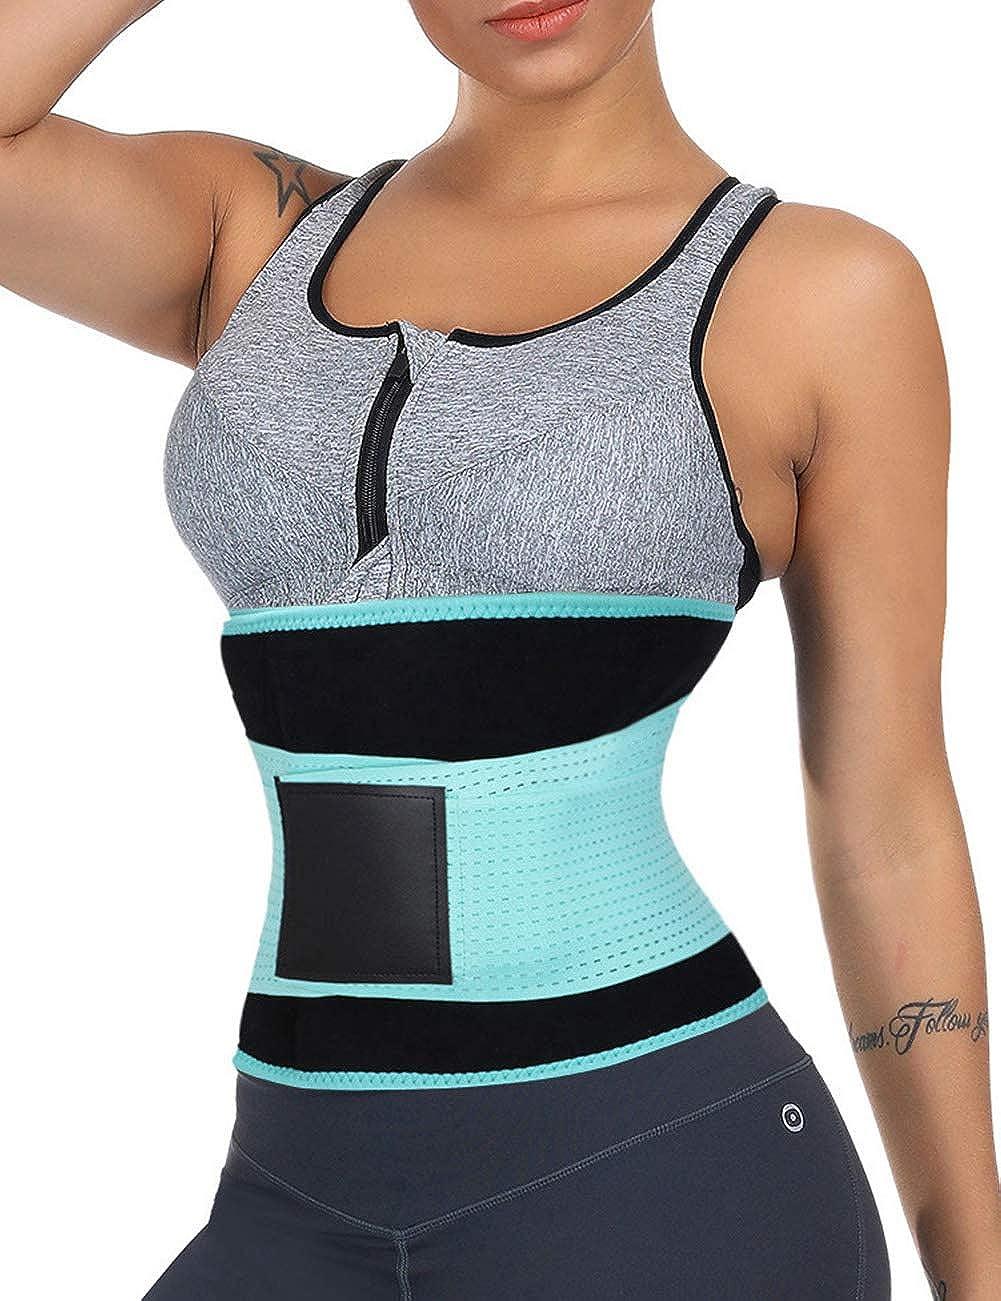 bluee1 WonderBeauty Women's Waist Trainer Belt Sport Girdle Shaperwear Waist Cincher